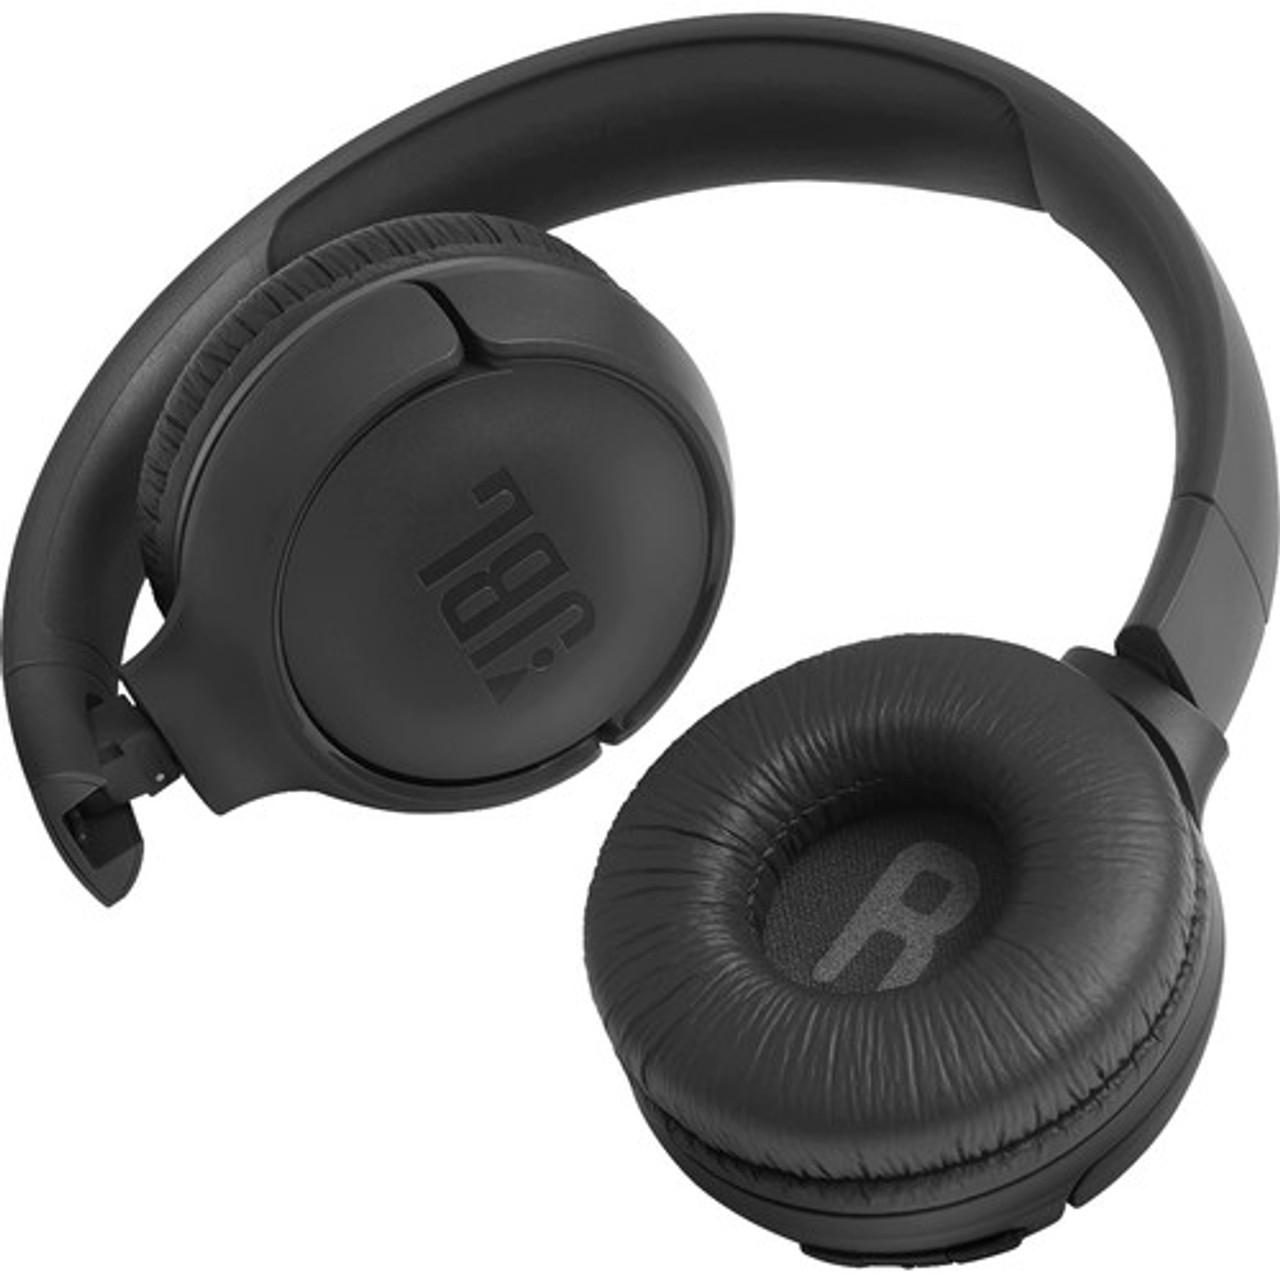 JBL JBLT500BTBLKAM-Z Tune 500BT Wireless On-Ear Headphones, Black – Certified Refurbished